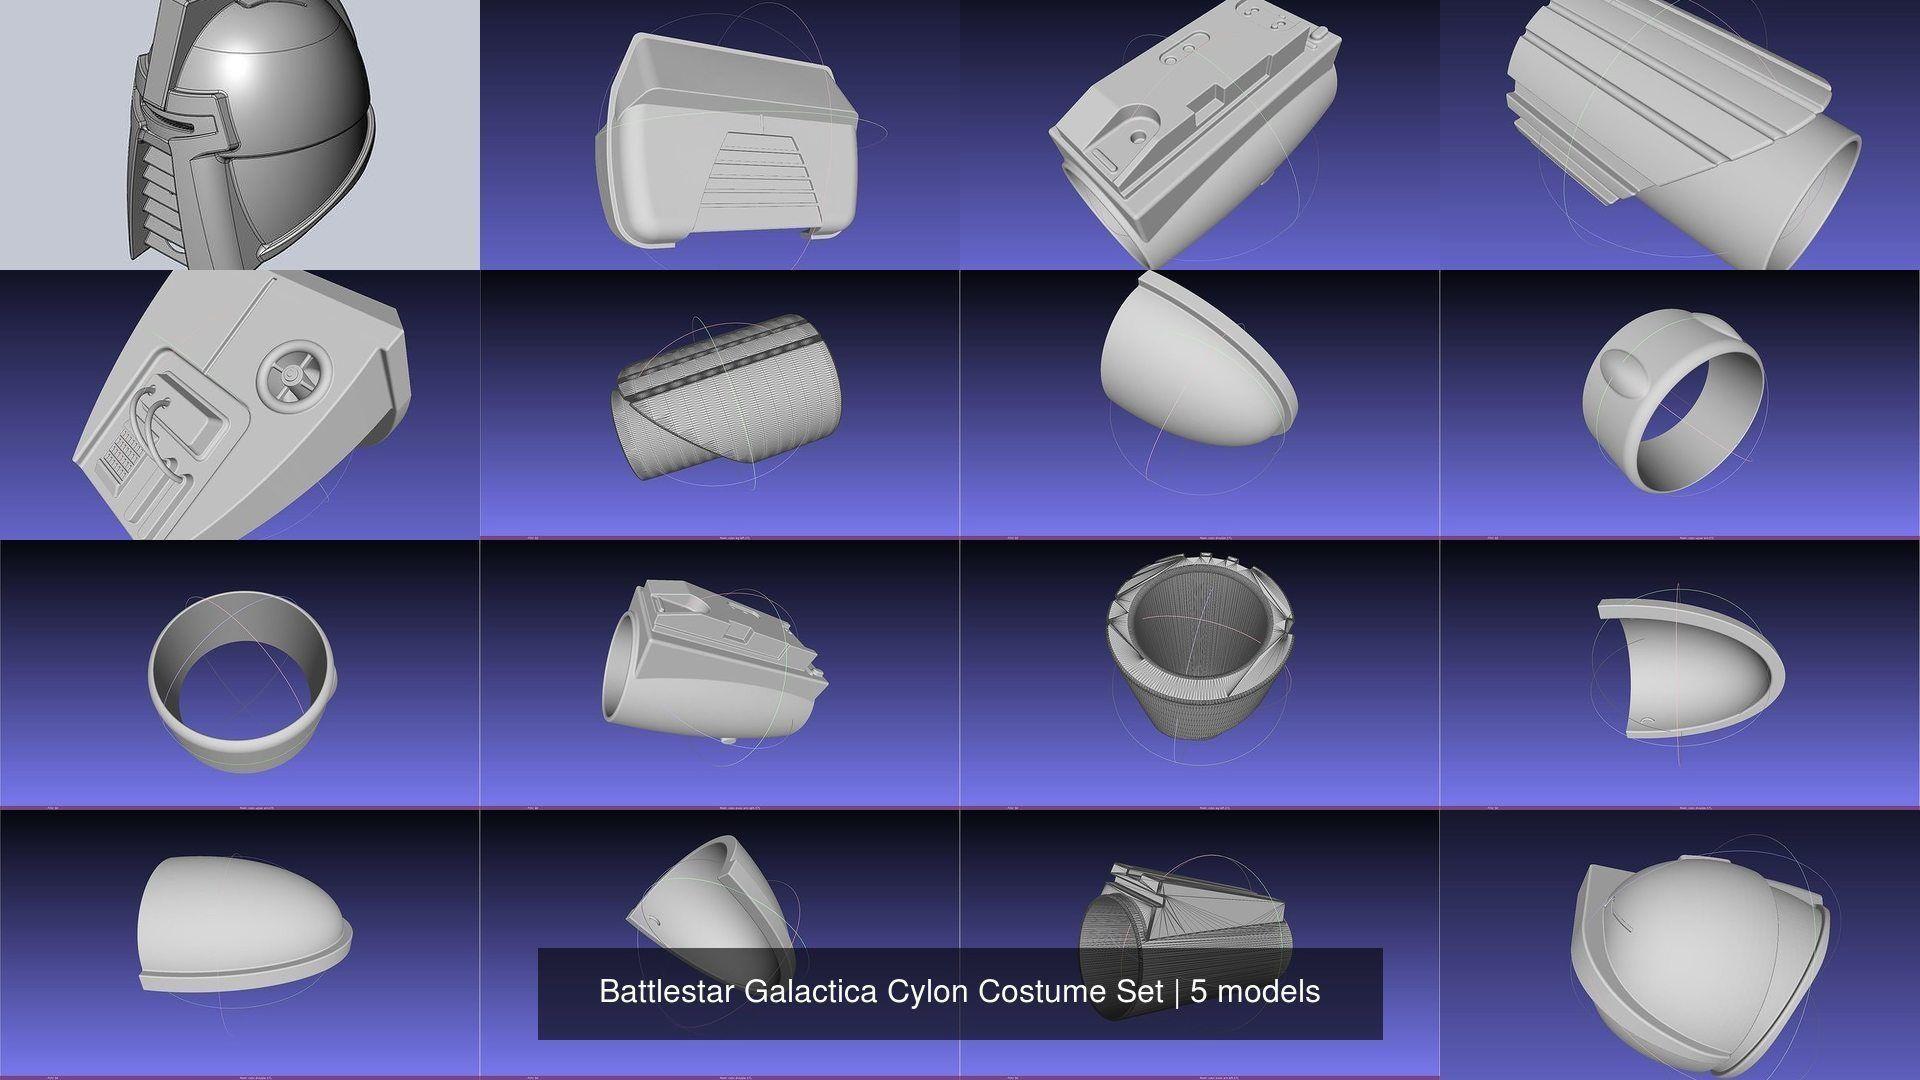 Battlestar Galactica Cylon Costume Set